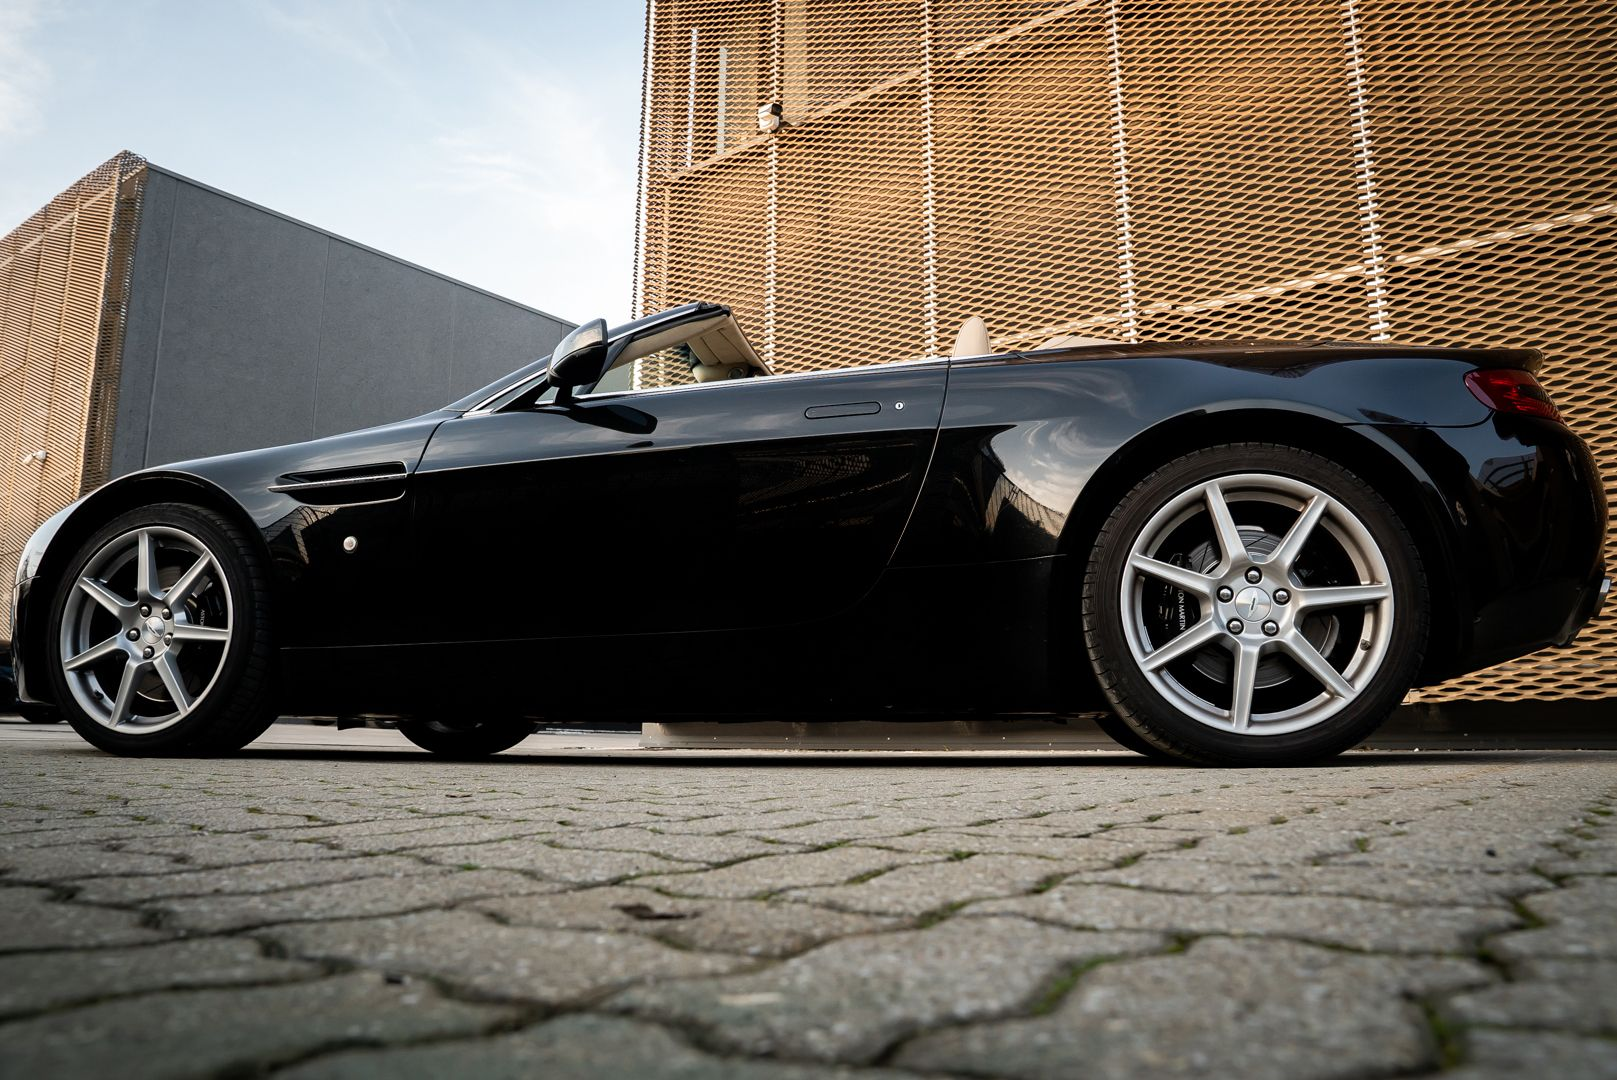 2008 Aston Martin 4.3 V8 Vantage Roadster N400 82808